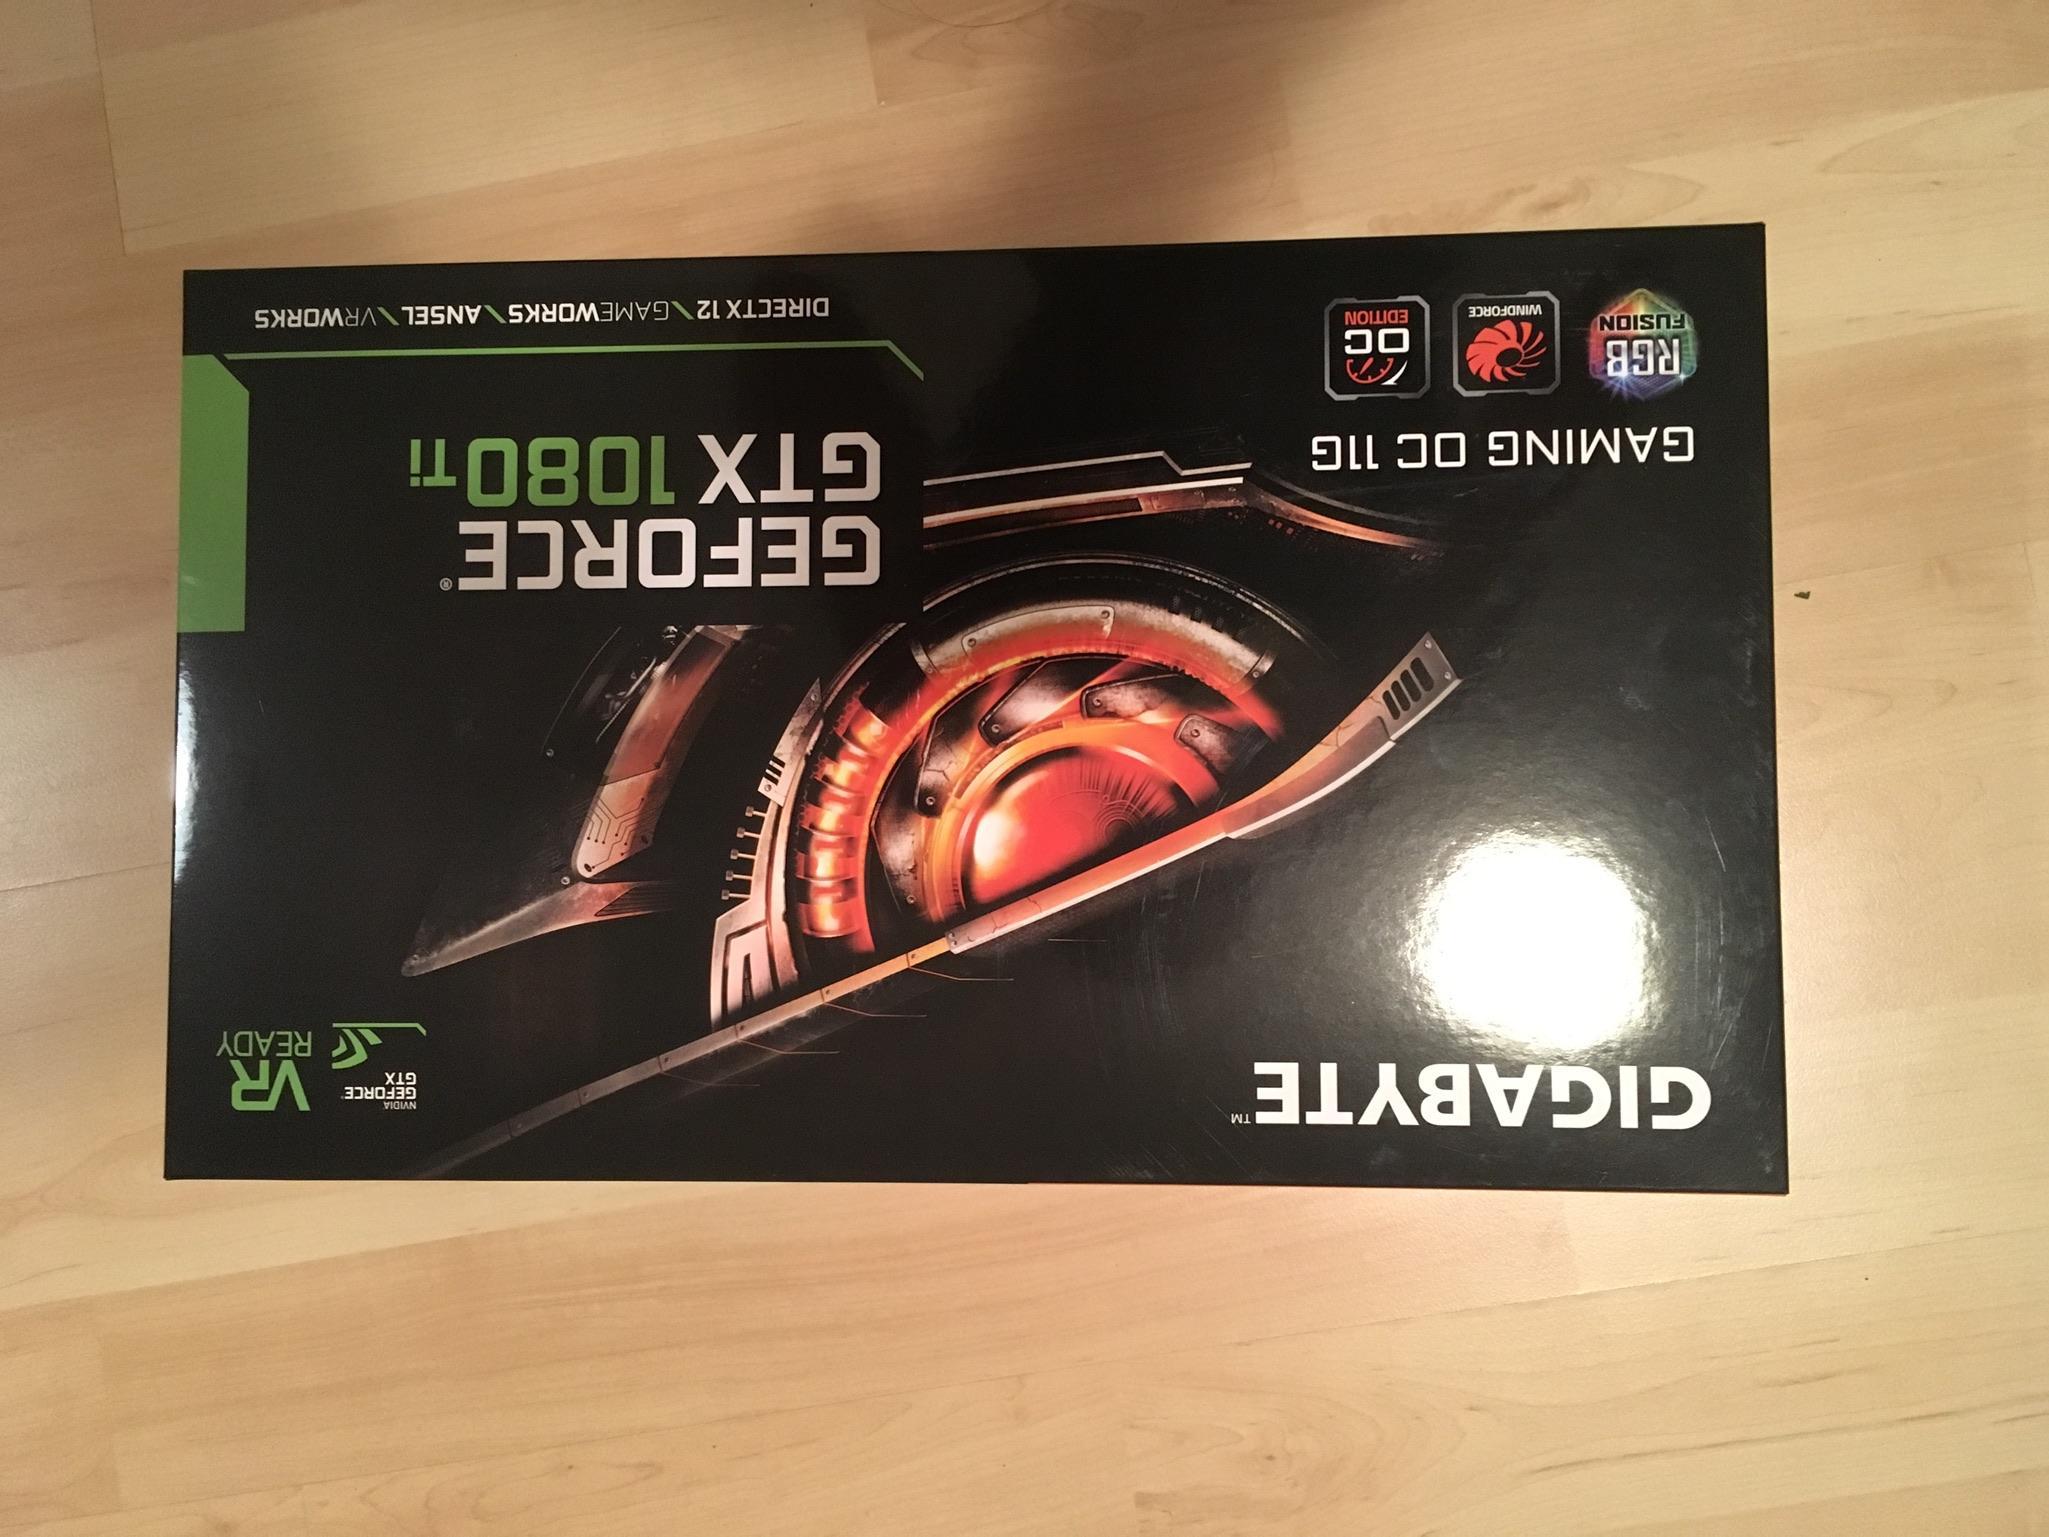 Nvidia Gigabyte Geforce Gtx 1080 Ti Neu In 81673 Munchen For 760 00 For Sale Shpock